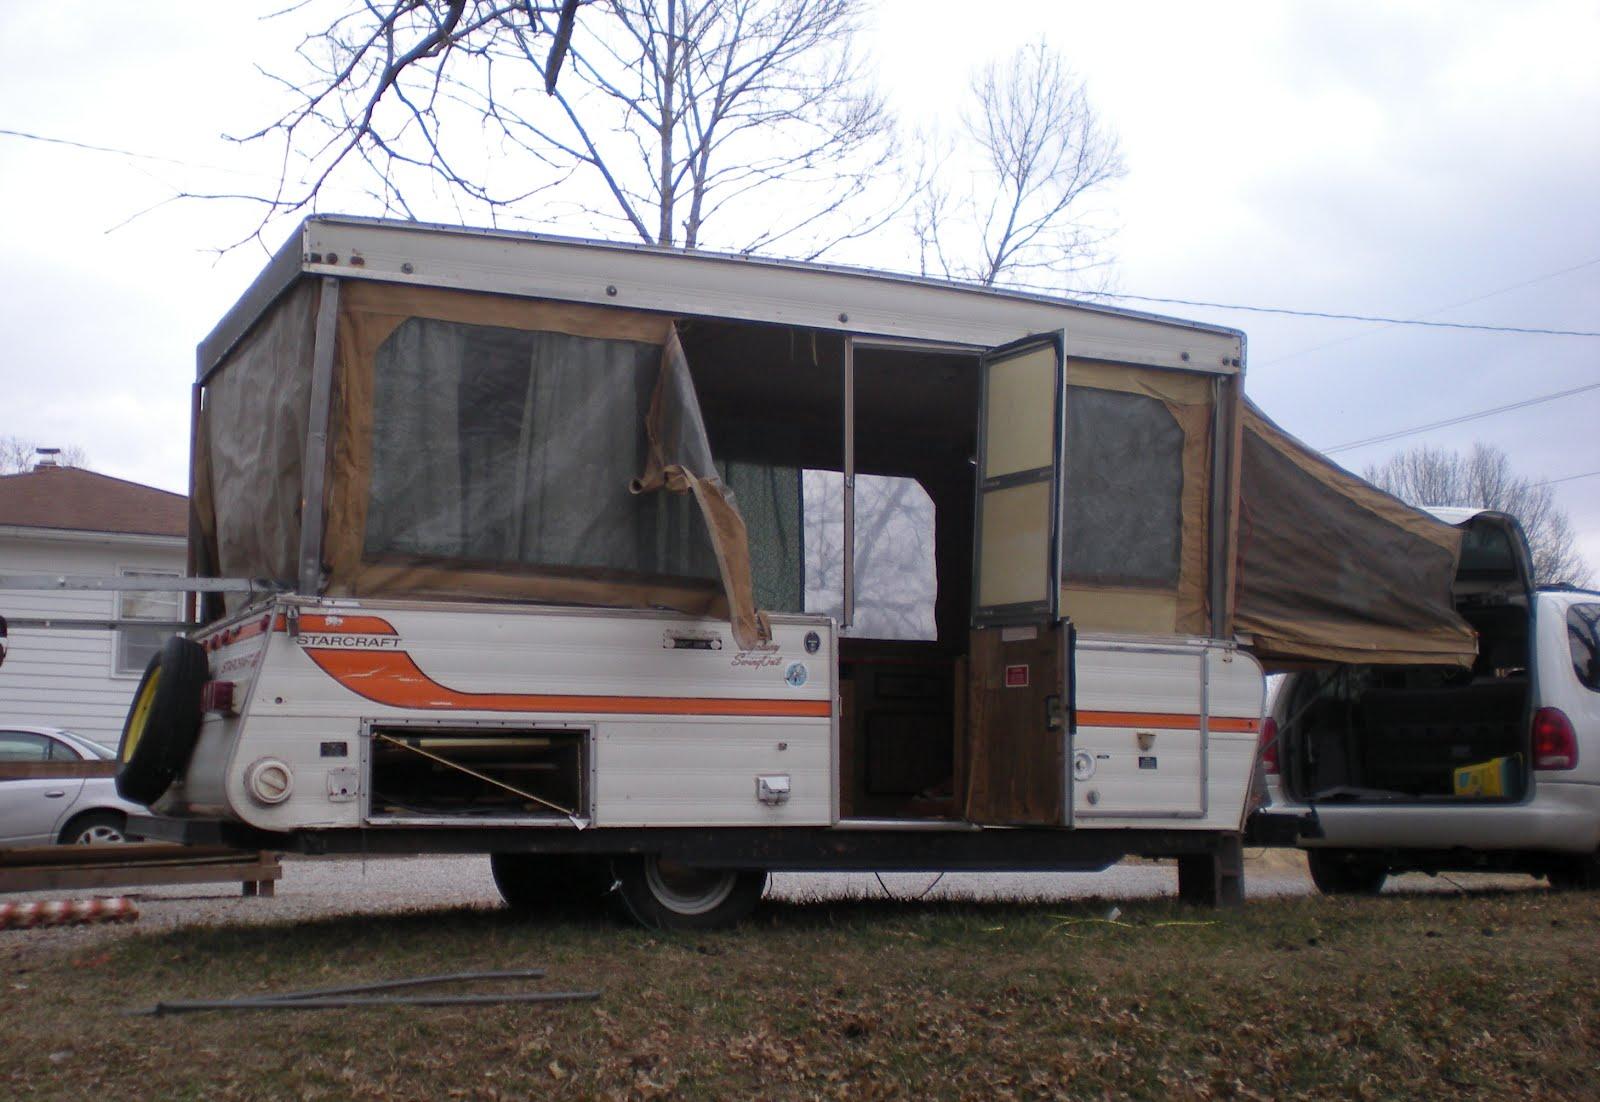 Camper%2BCurb%2BSide rational living the camper project